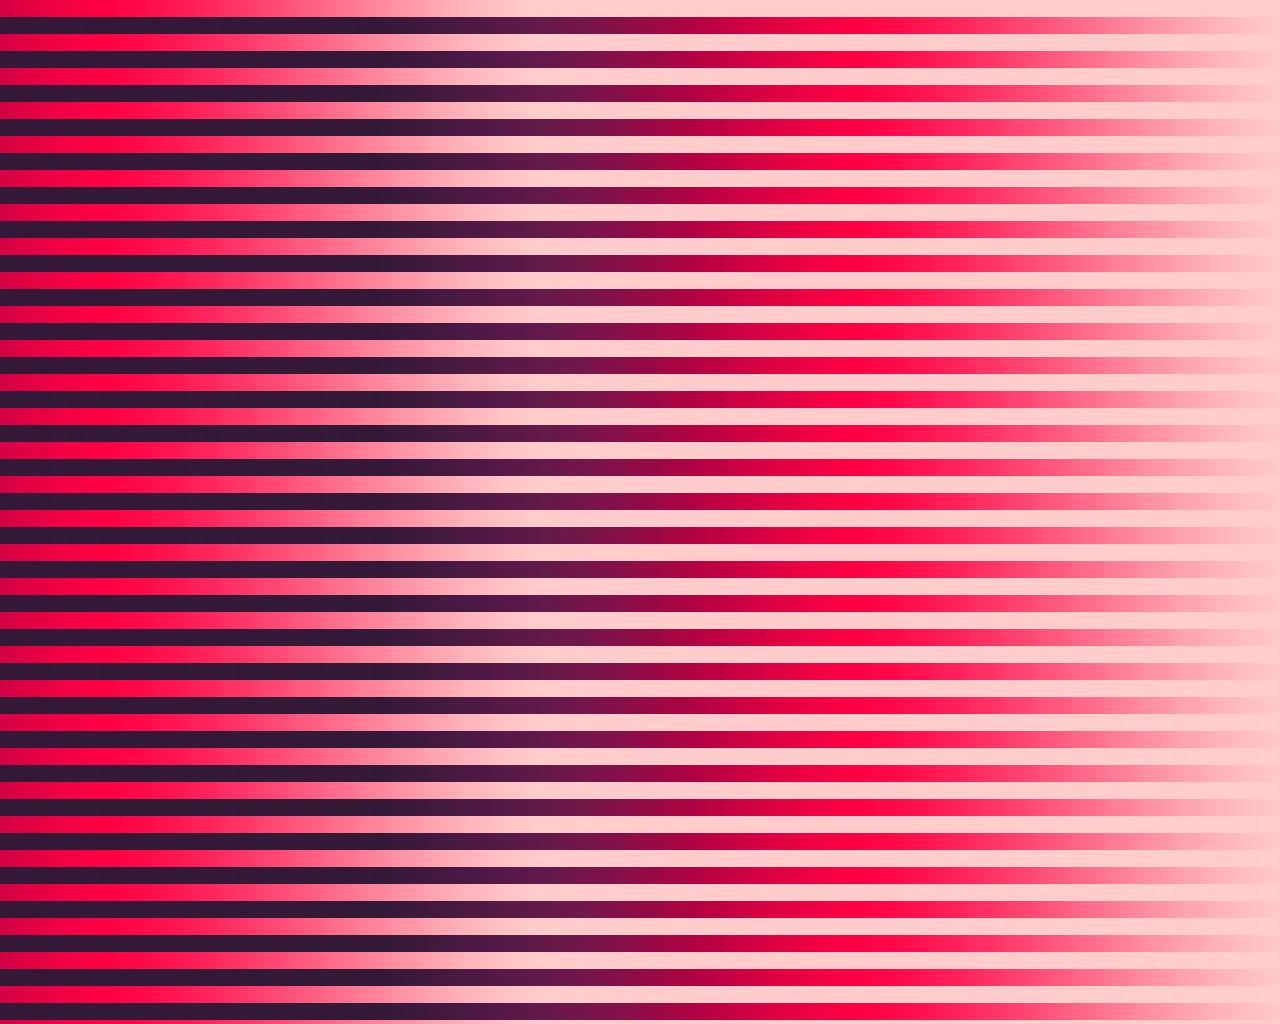 Pink pattern stripes - photo#13